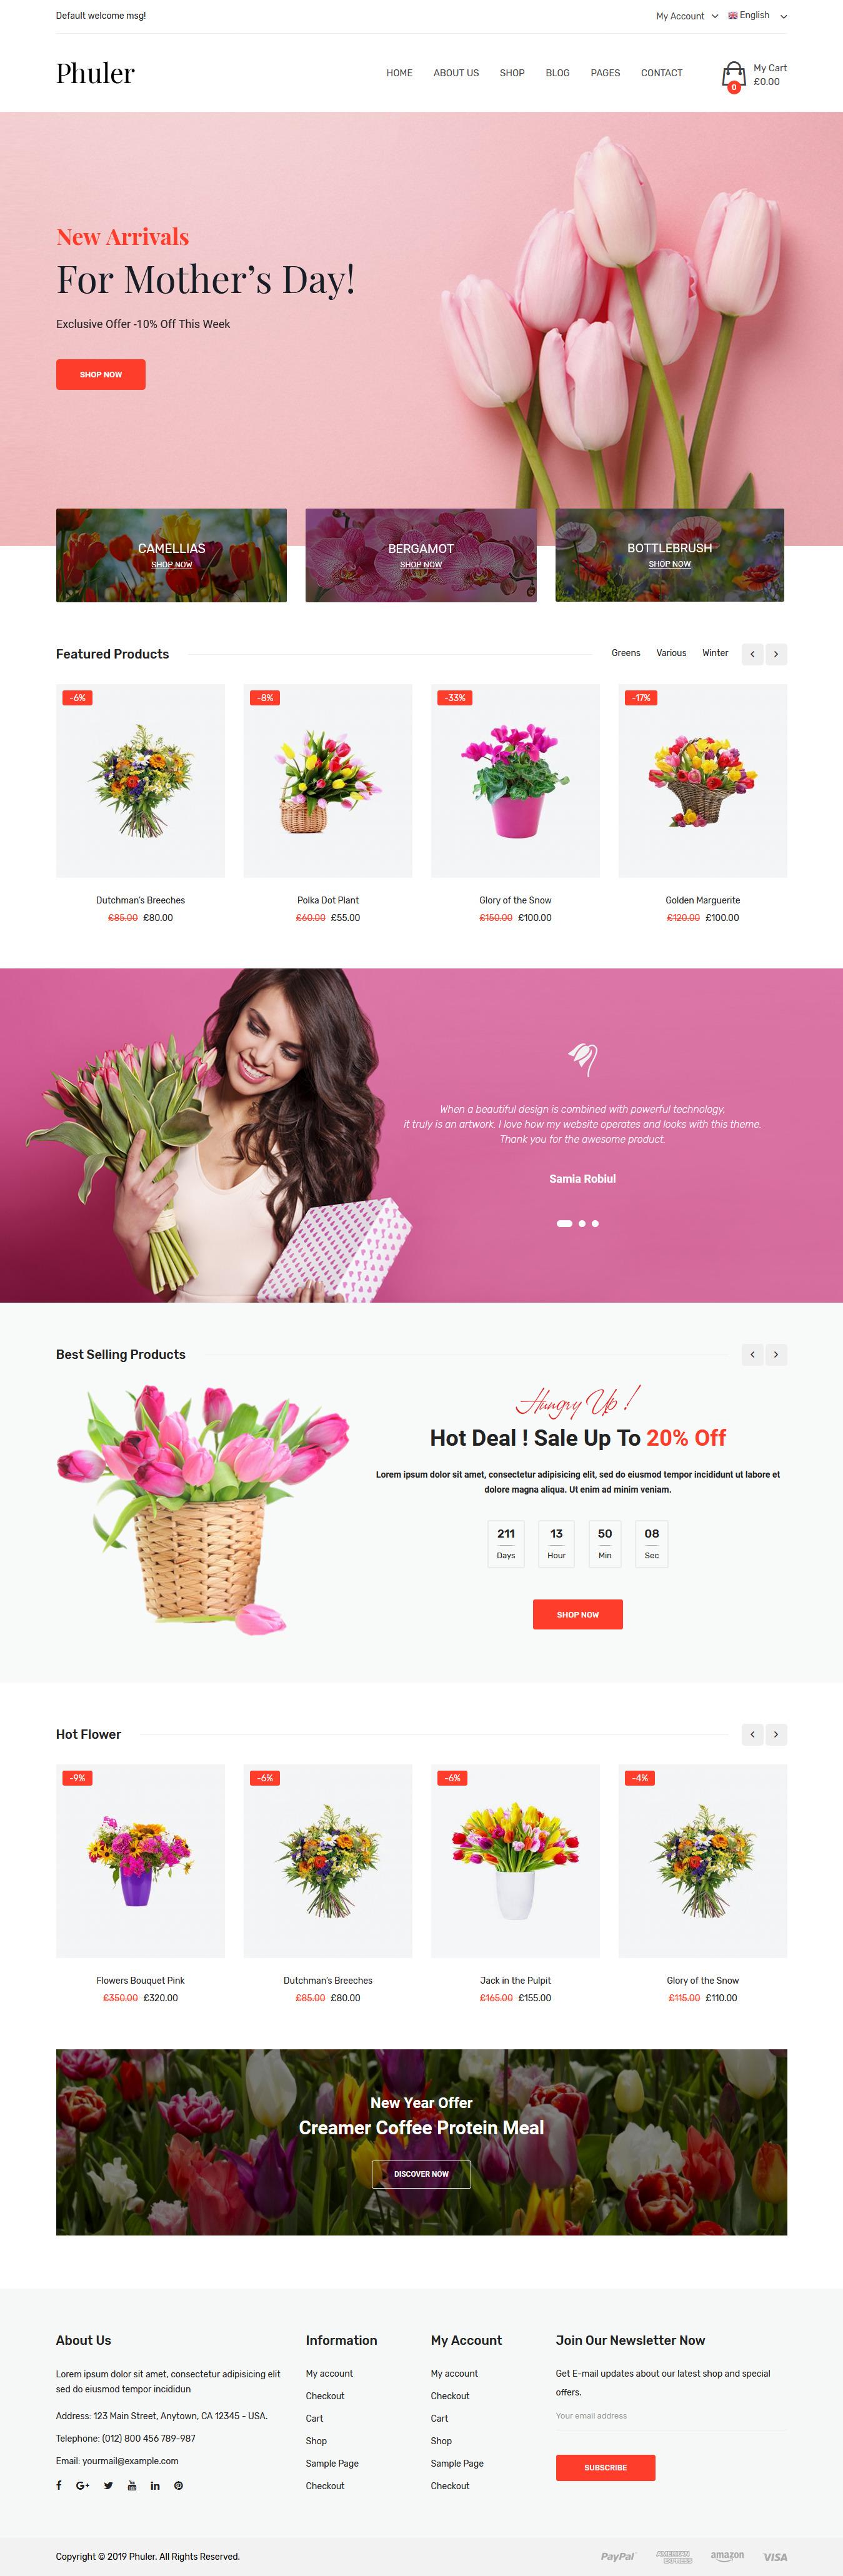 Phuler – Best Premium Florist and Floriculture WordPress Theme